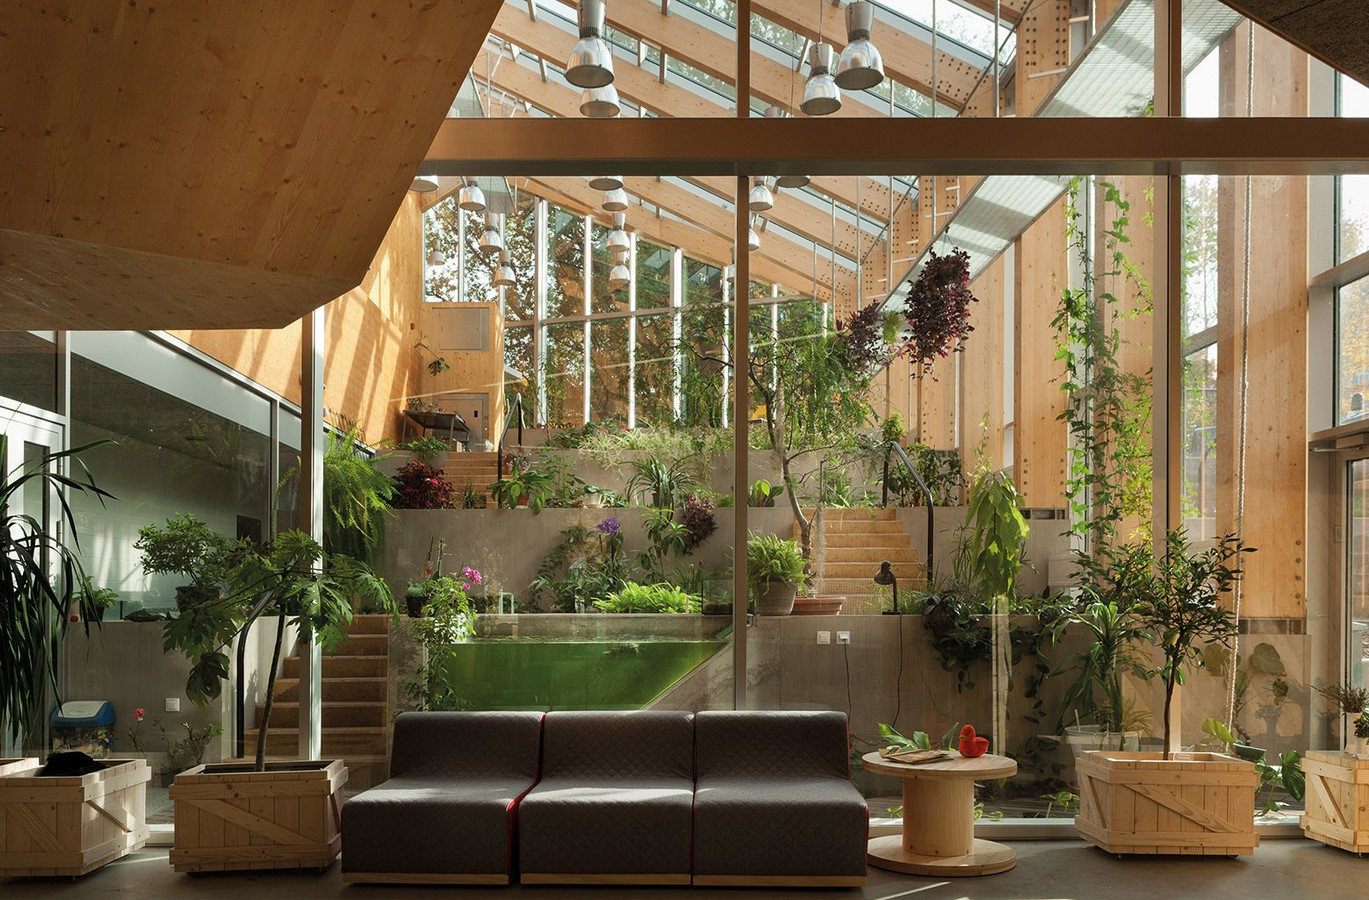 Views and Interior elements - Sheet2